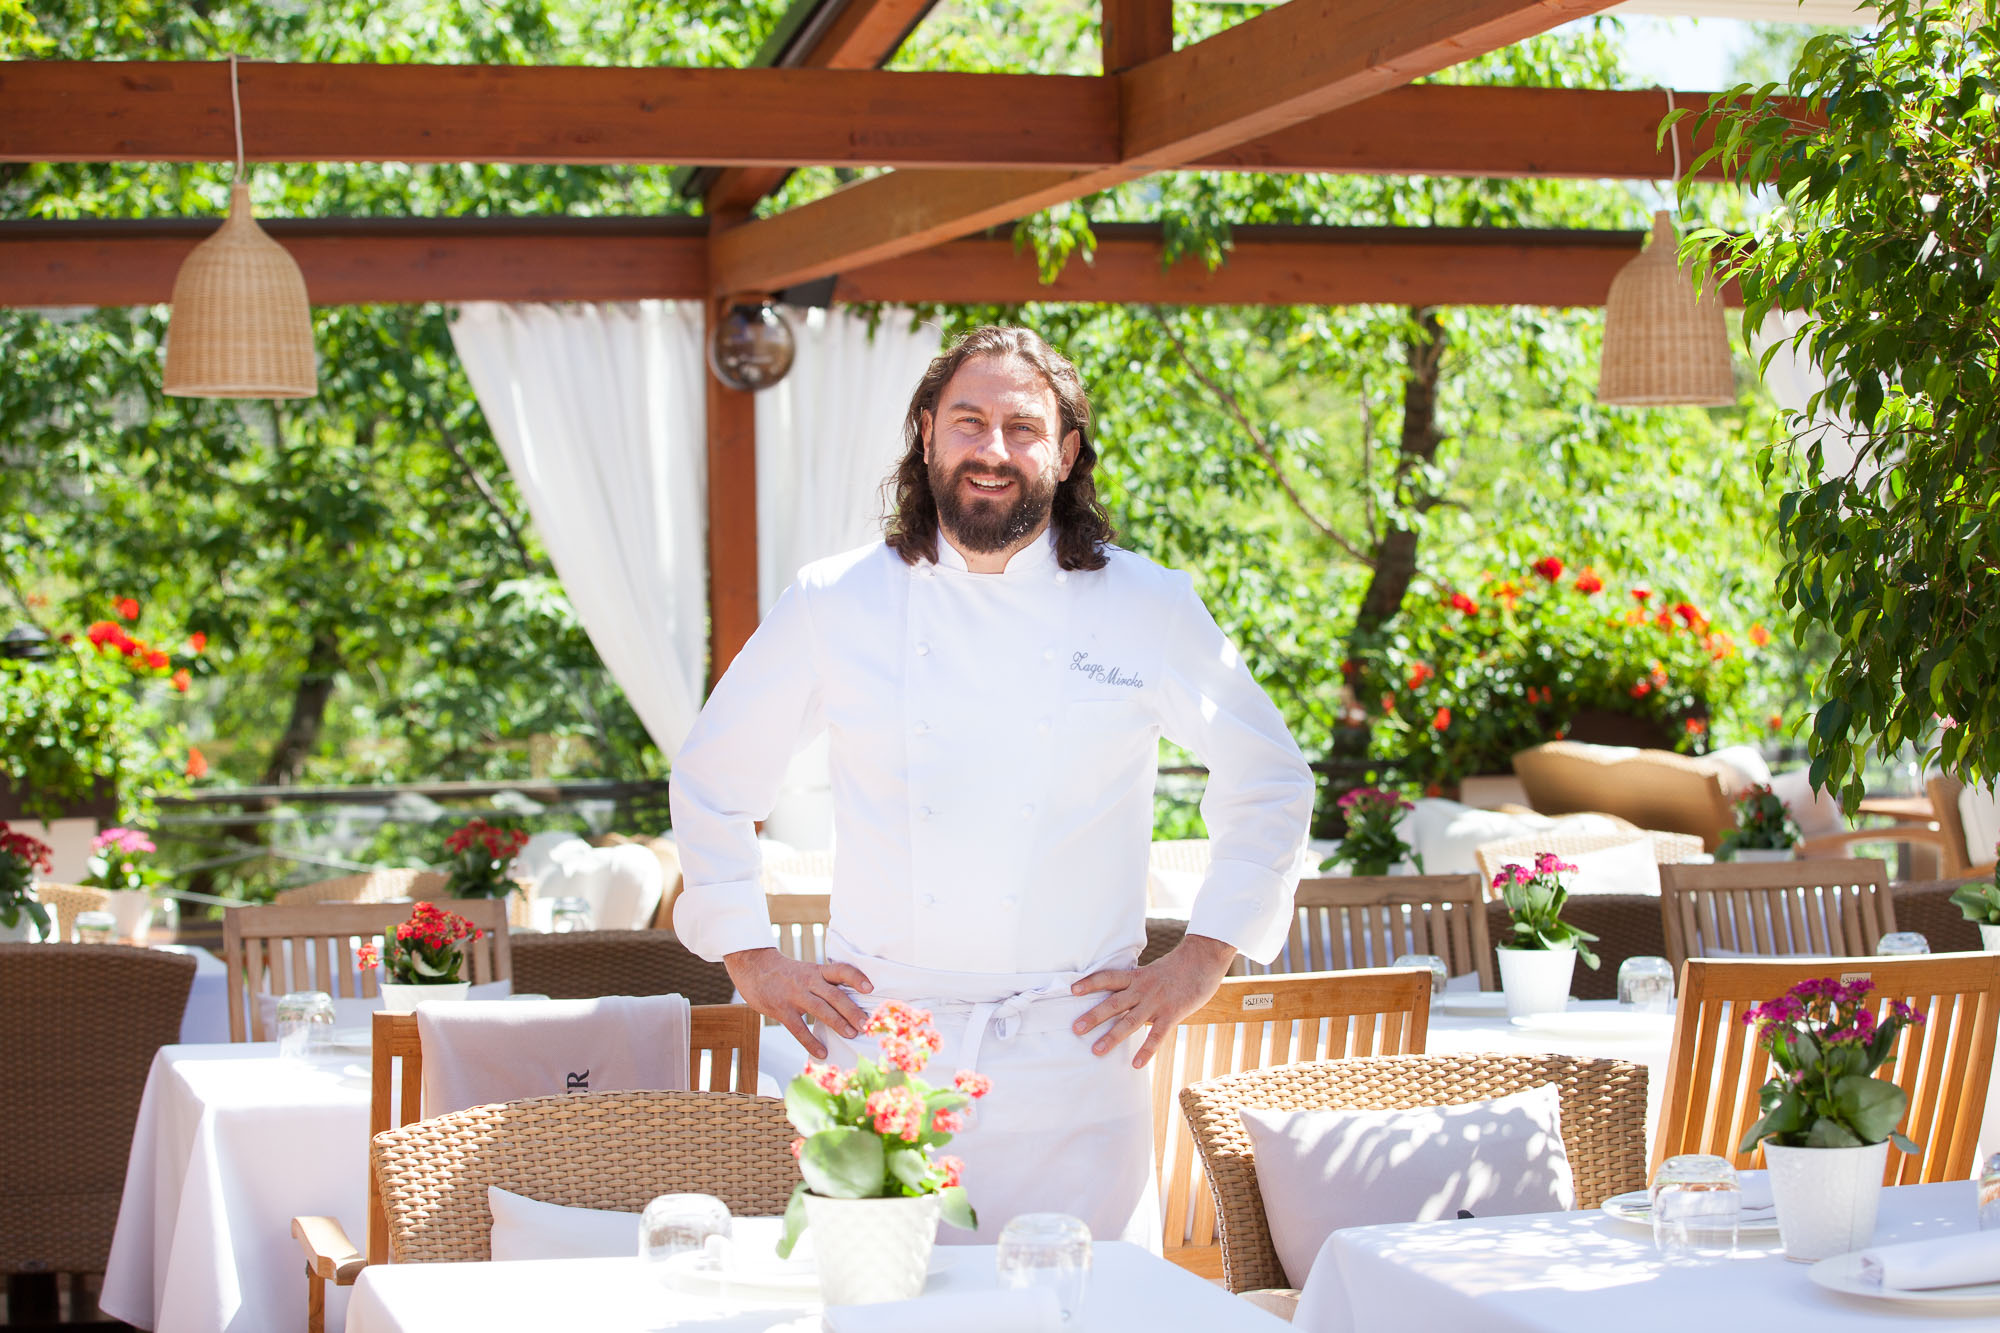 Мирко Дзаго, шеф-повар ресторанов «Аист», Bro&N, La Fabbrica, Officina и судья шоу «Мастер шеф»